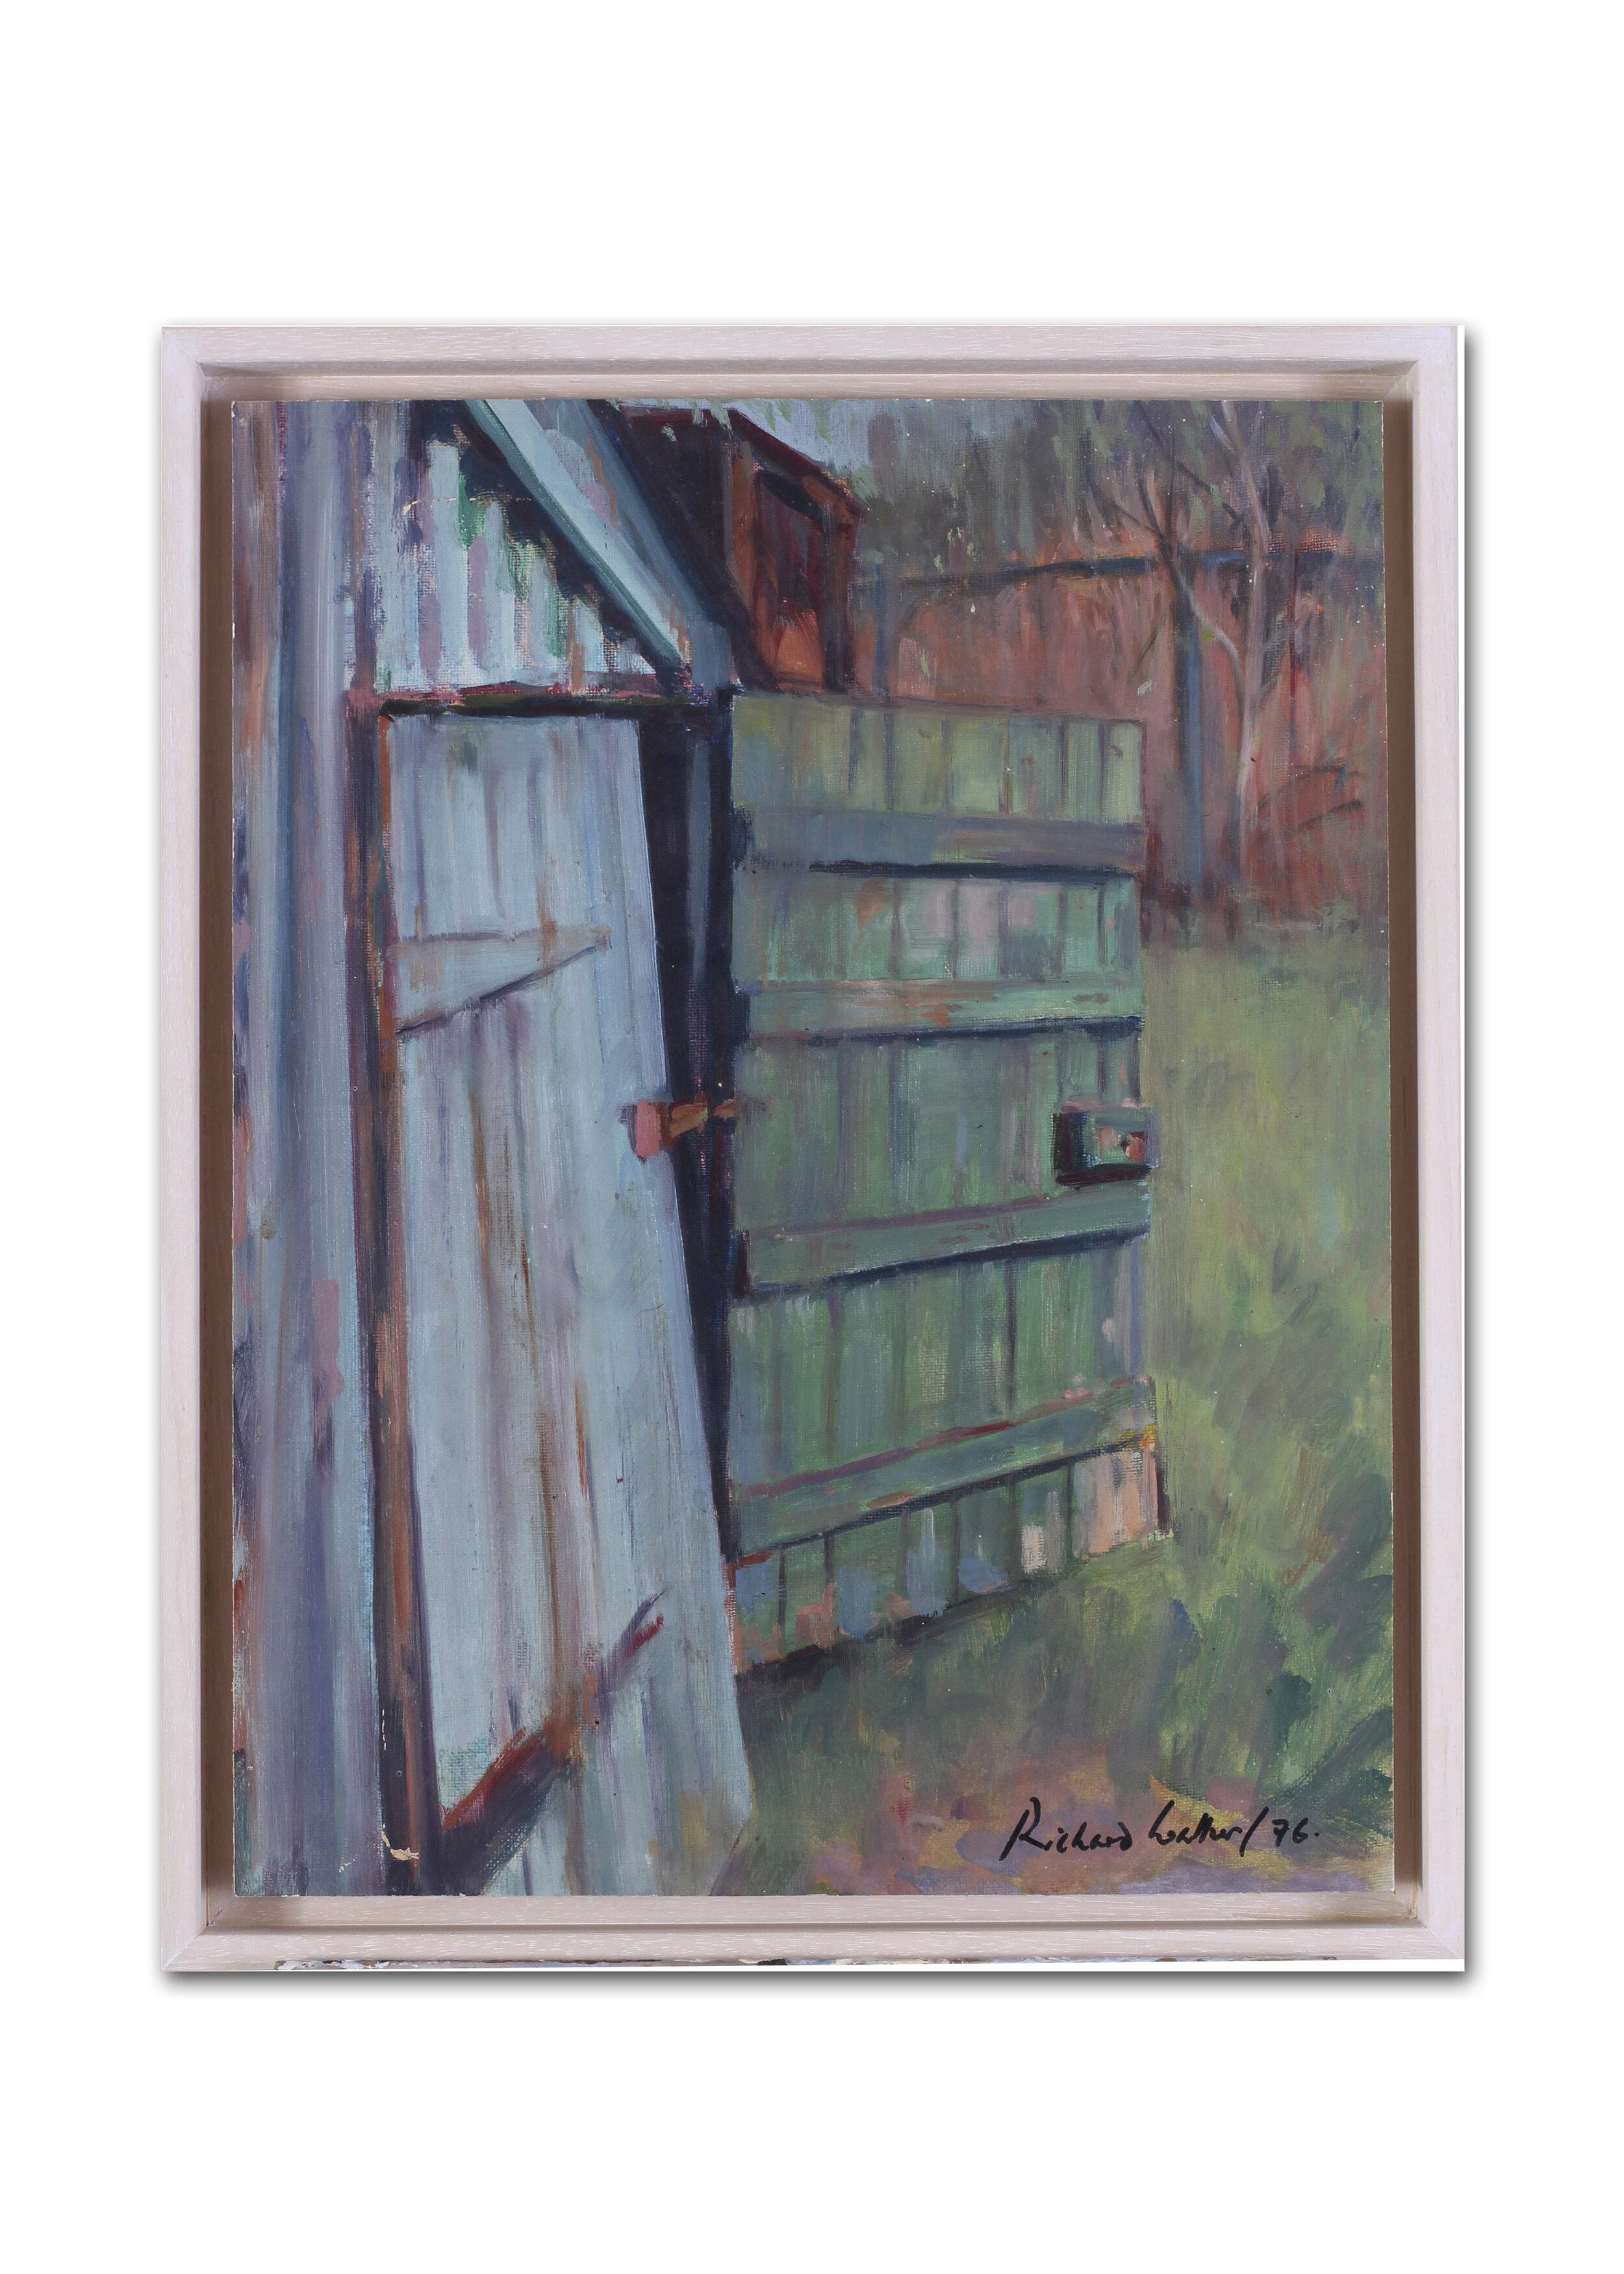 Richard Walker  The garden shed  Price: £410